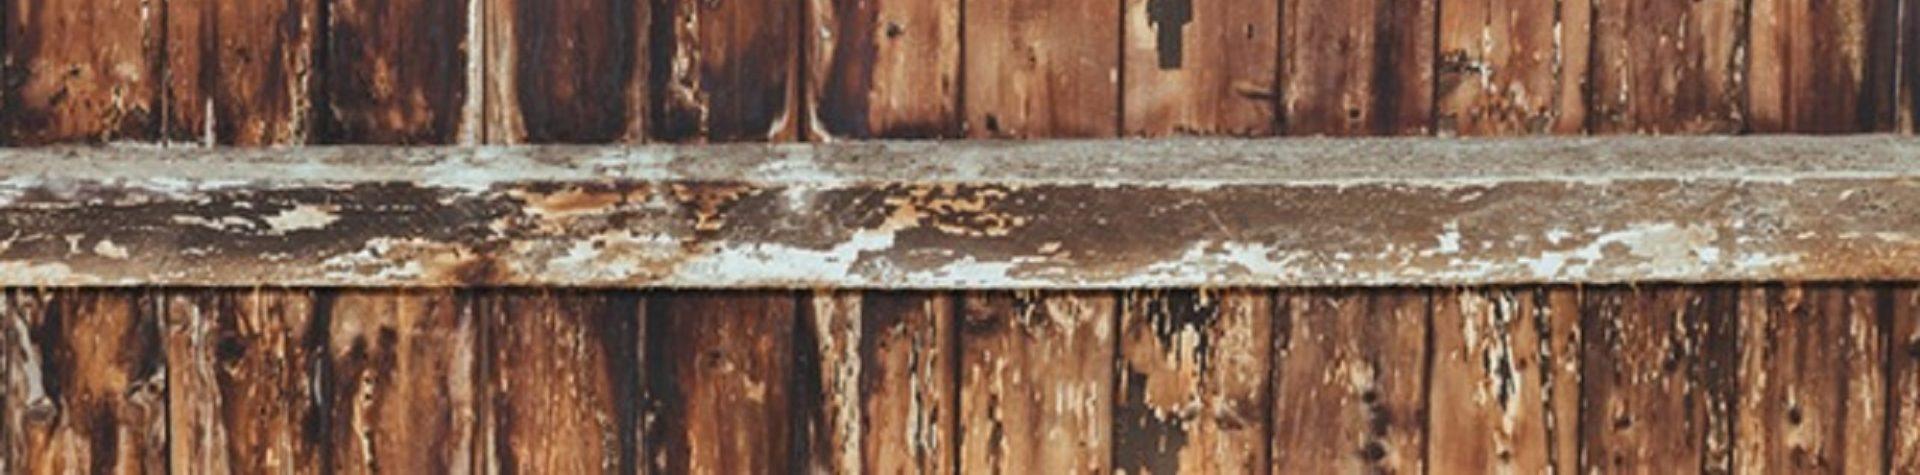 Best Fence Company in Glendale AZ 602-362-9695